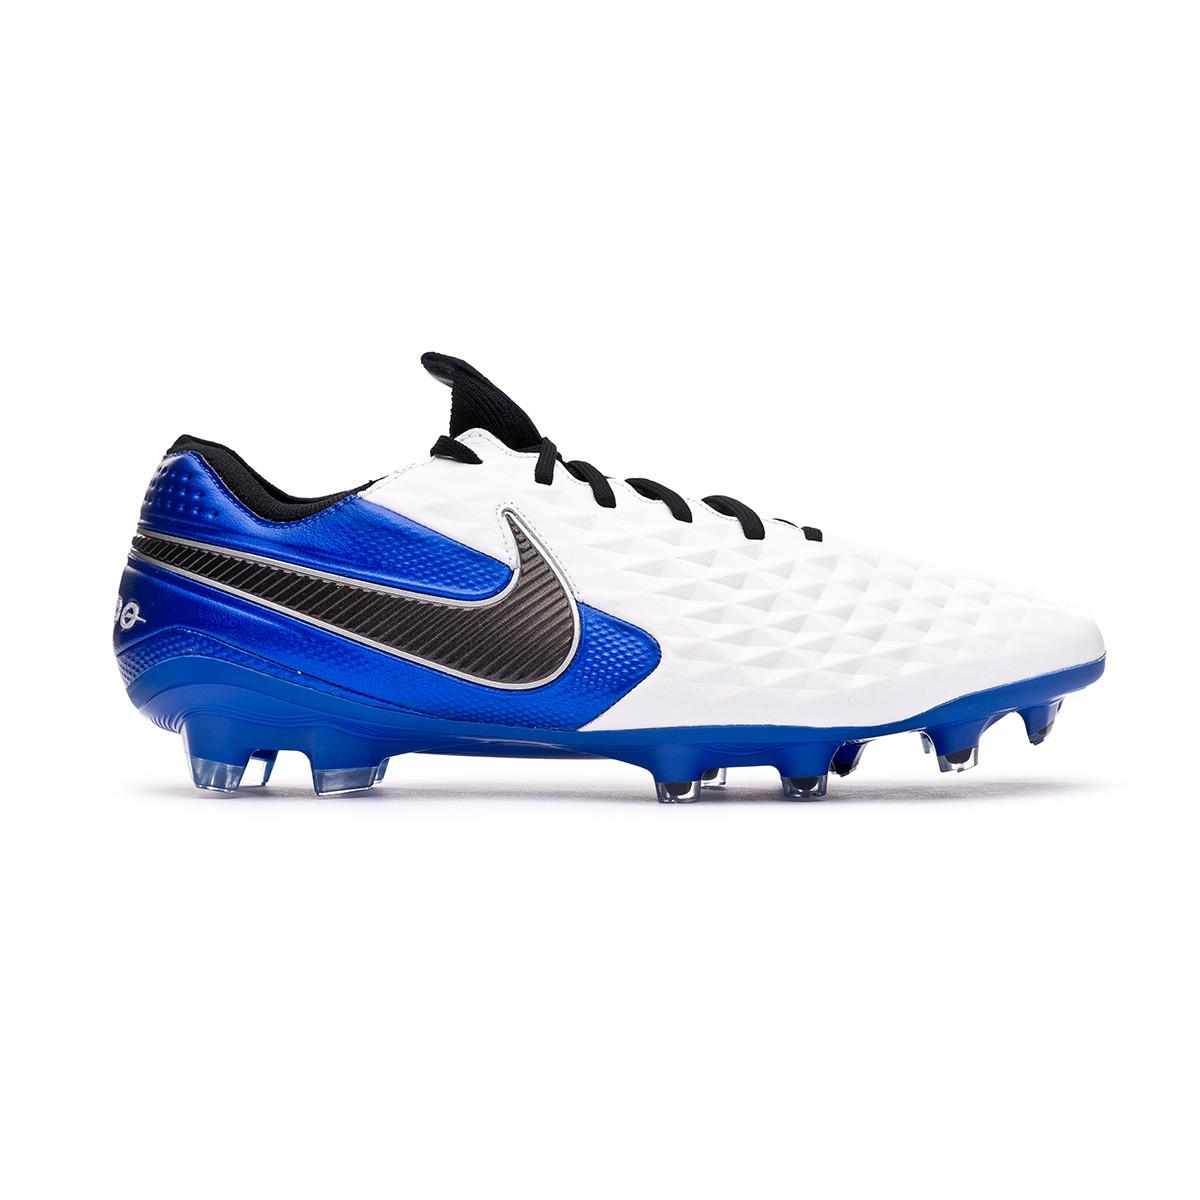 Acelerar Guardería hacerte molestar  Football Boots Nike Tiempo Legend VIII Elite FG White-Black-Hyper  royal-Metallic silver - Football store Fútbol Emotion